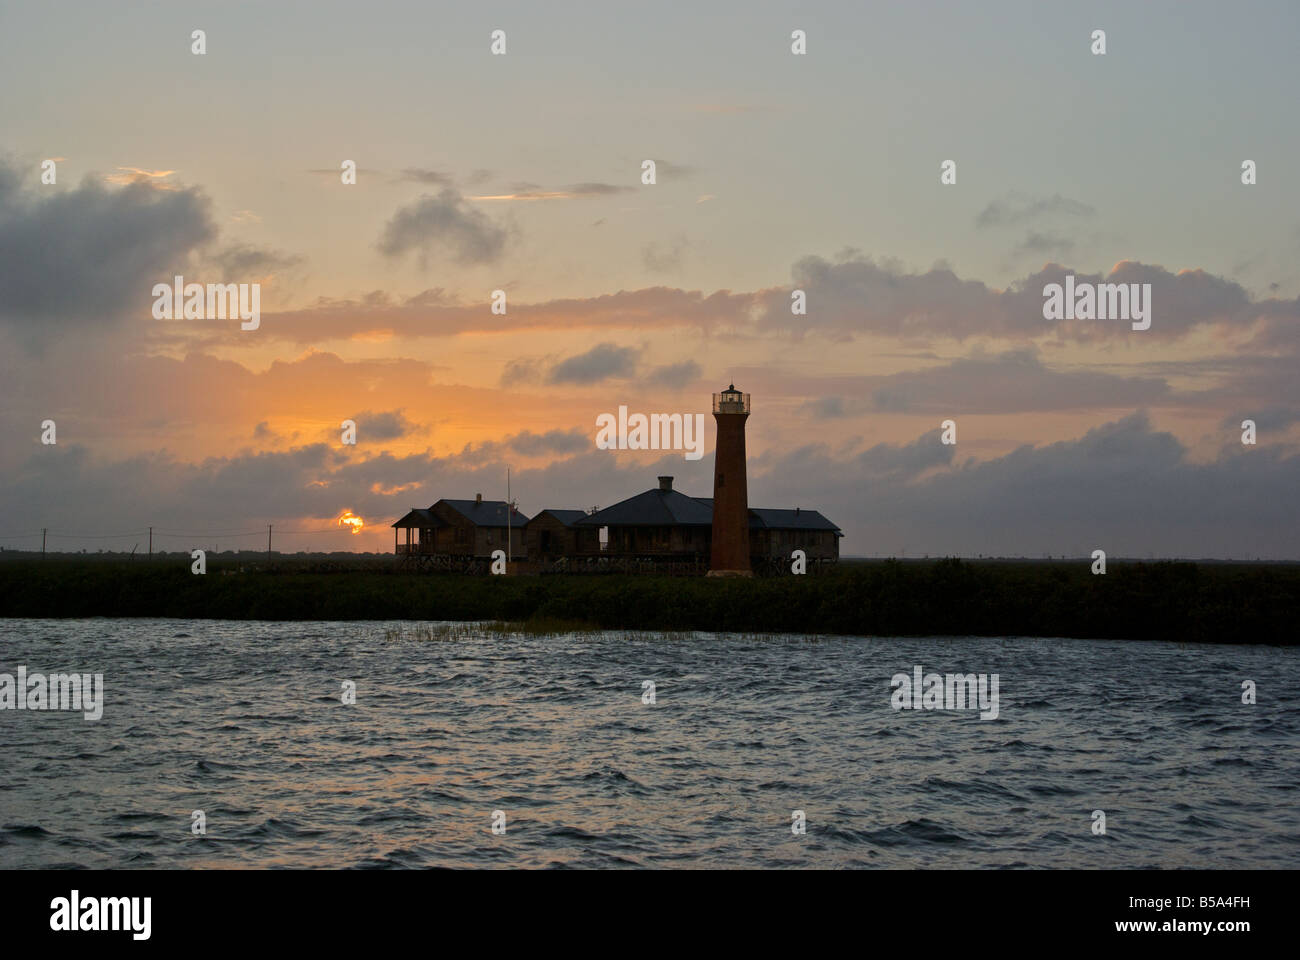 Dramatic sunset through clouds over Lydia Ann lighthouse at Aransas Pass - Stock Image